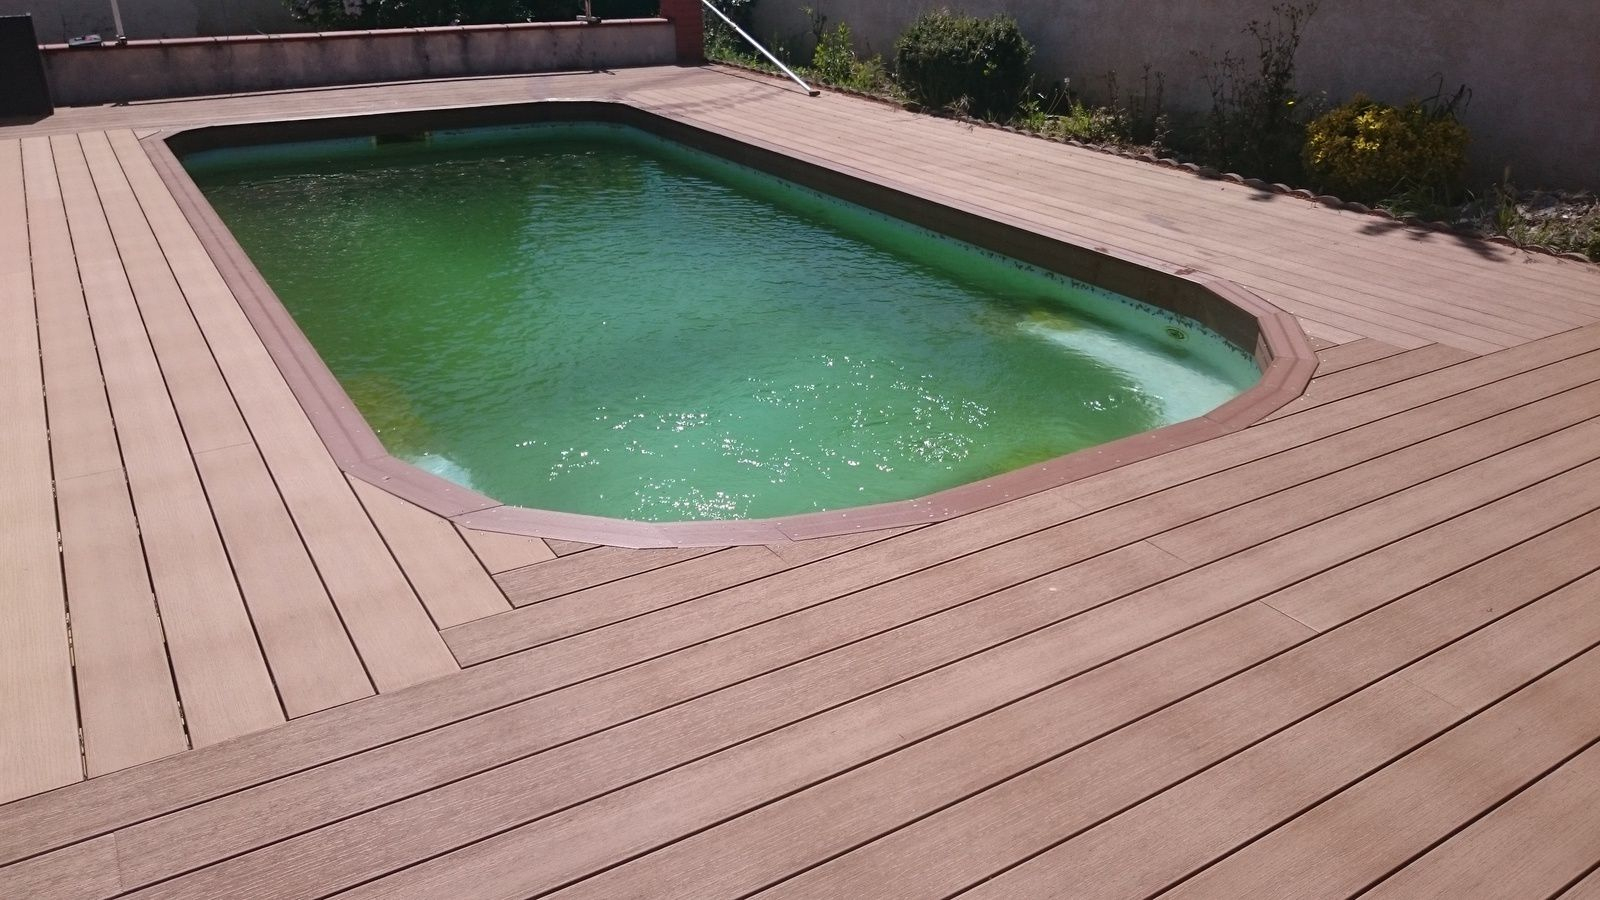 Projet Terrasse Piscine Composite = Rénovation Et Habillage ... dedans Margelle Piscine Composite